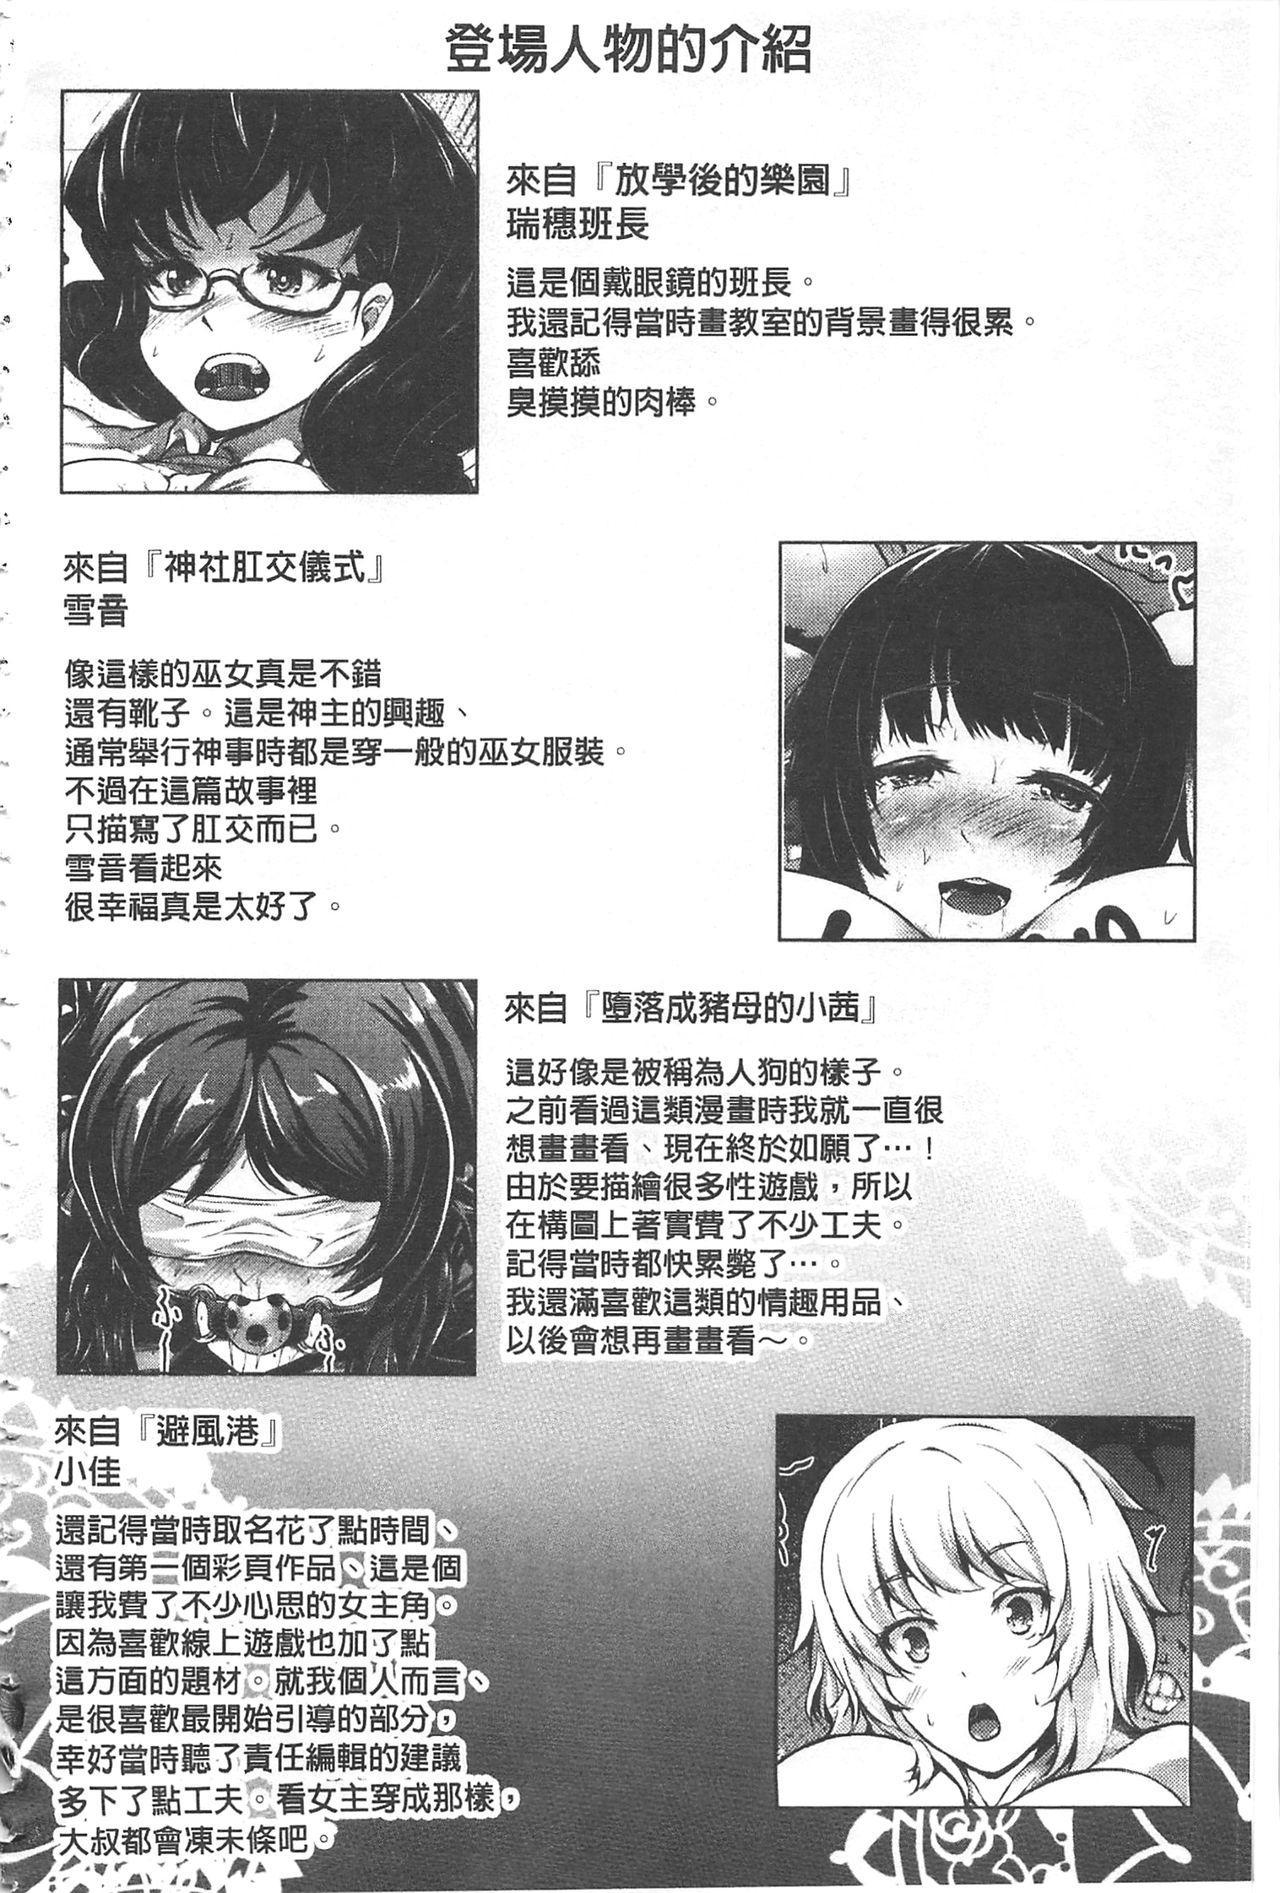 [Lorica] Biinkan Anal ~Kakusei Nejikomi Ana~ | 美淫感猥菊花 塞入擴張覺醒穴 [Chinese] 198